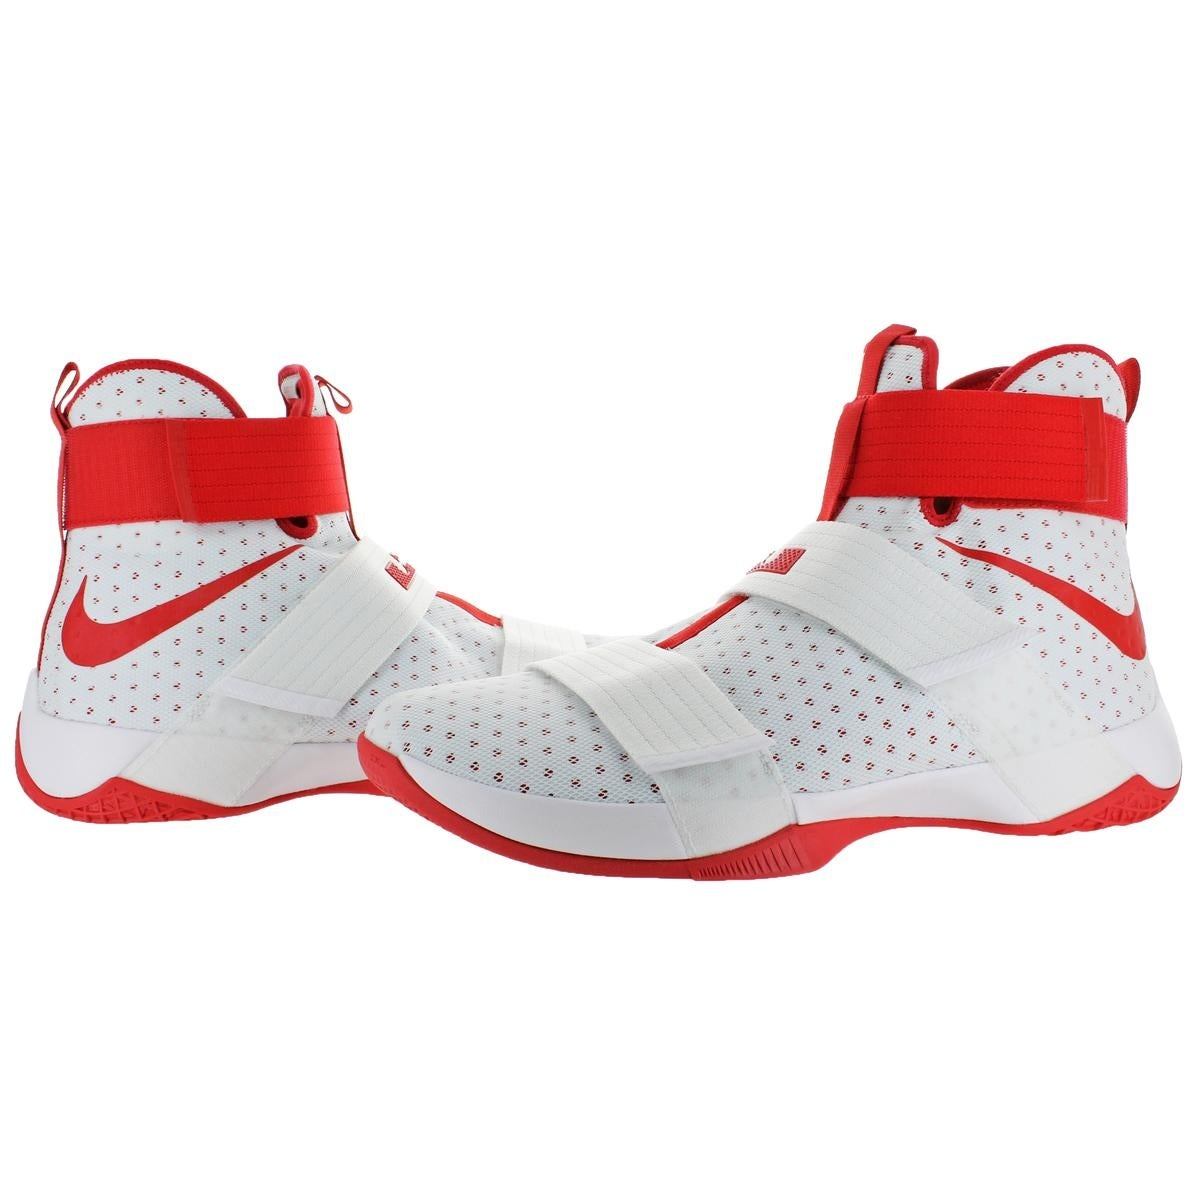 dc0da826f61 hot air max 95 and jordan cheap 9245e 09b3f  release date shop nike lebron  soldier 10 mens mesh high top basketball shoes white size 18